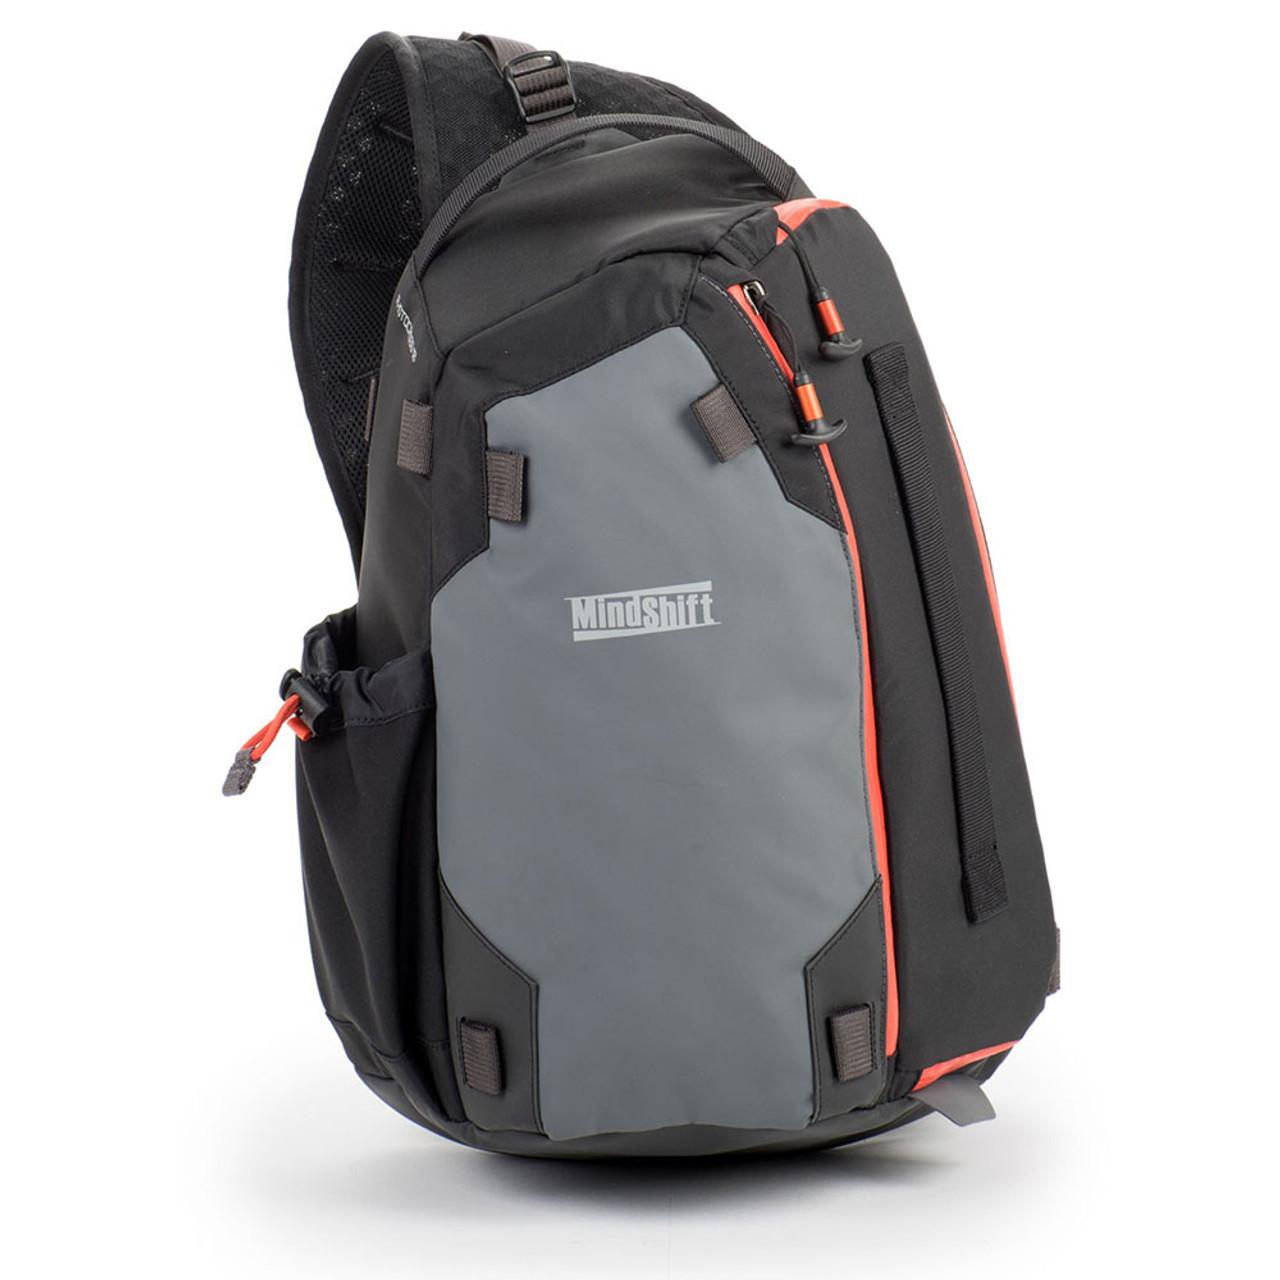 MINDSHIFT PHOTOCROSS 10 SLING BAG